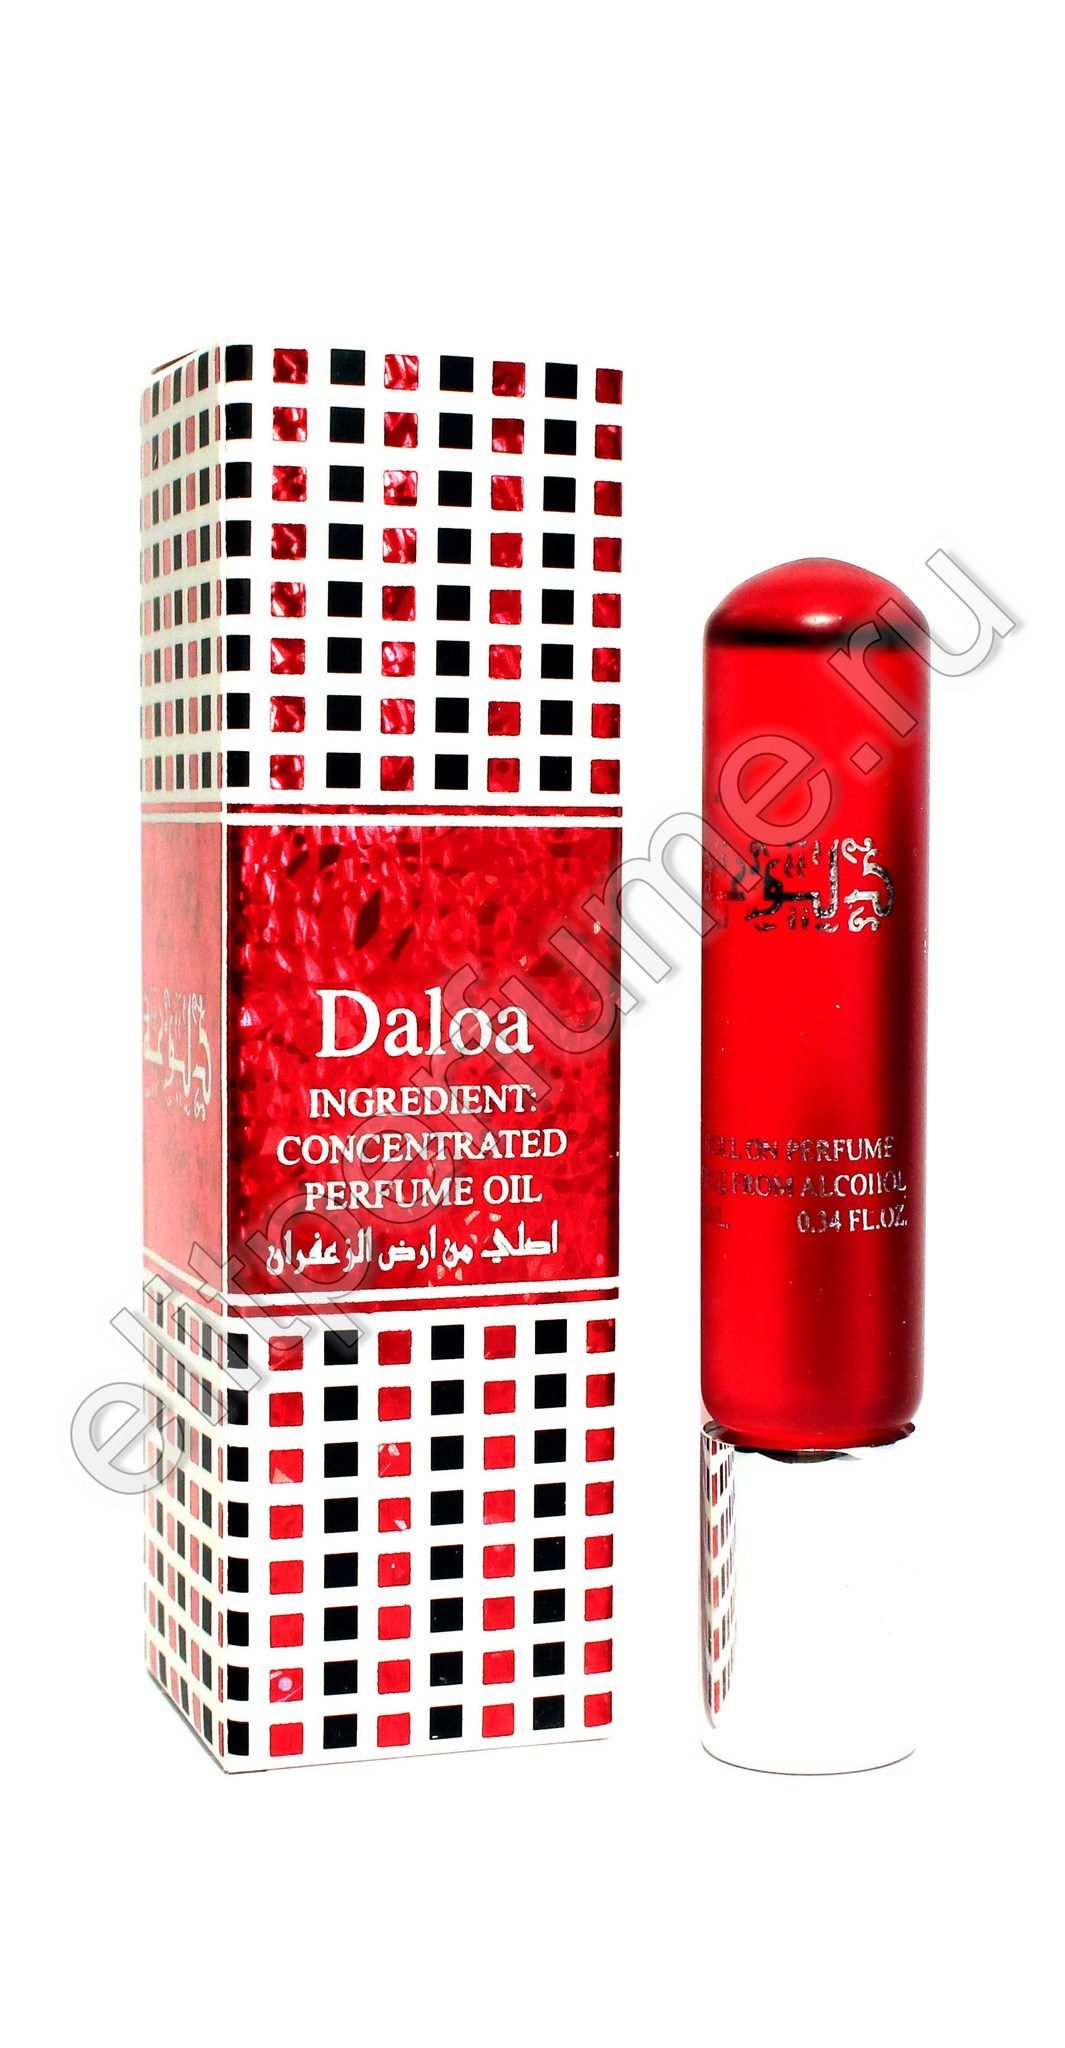 Daloa Далоа 10 мл арабские масляные духи от Ард Аль Заафаран Ard Al Zaafaran